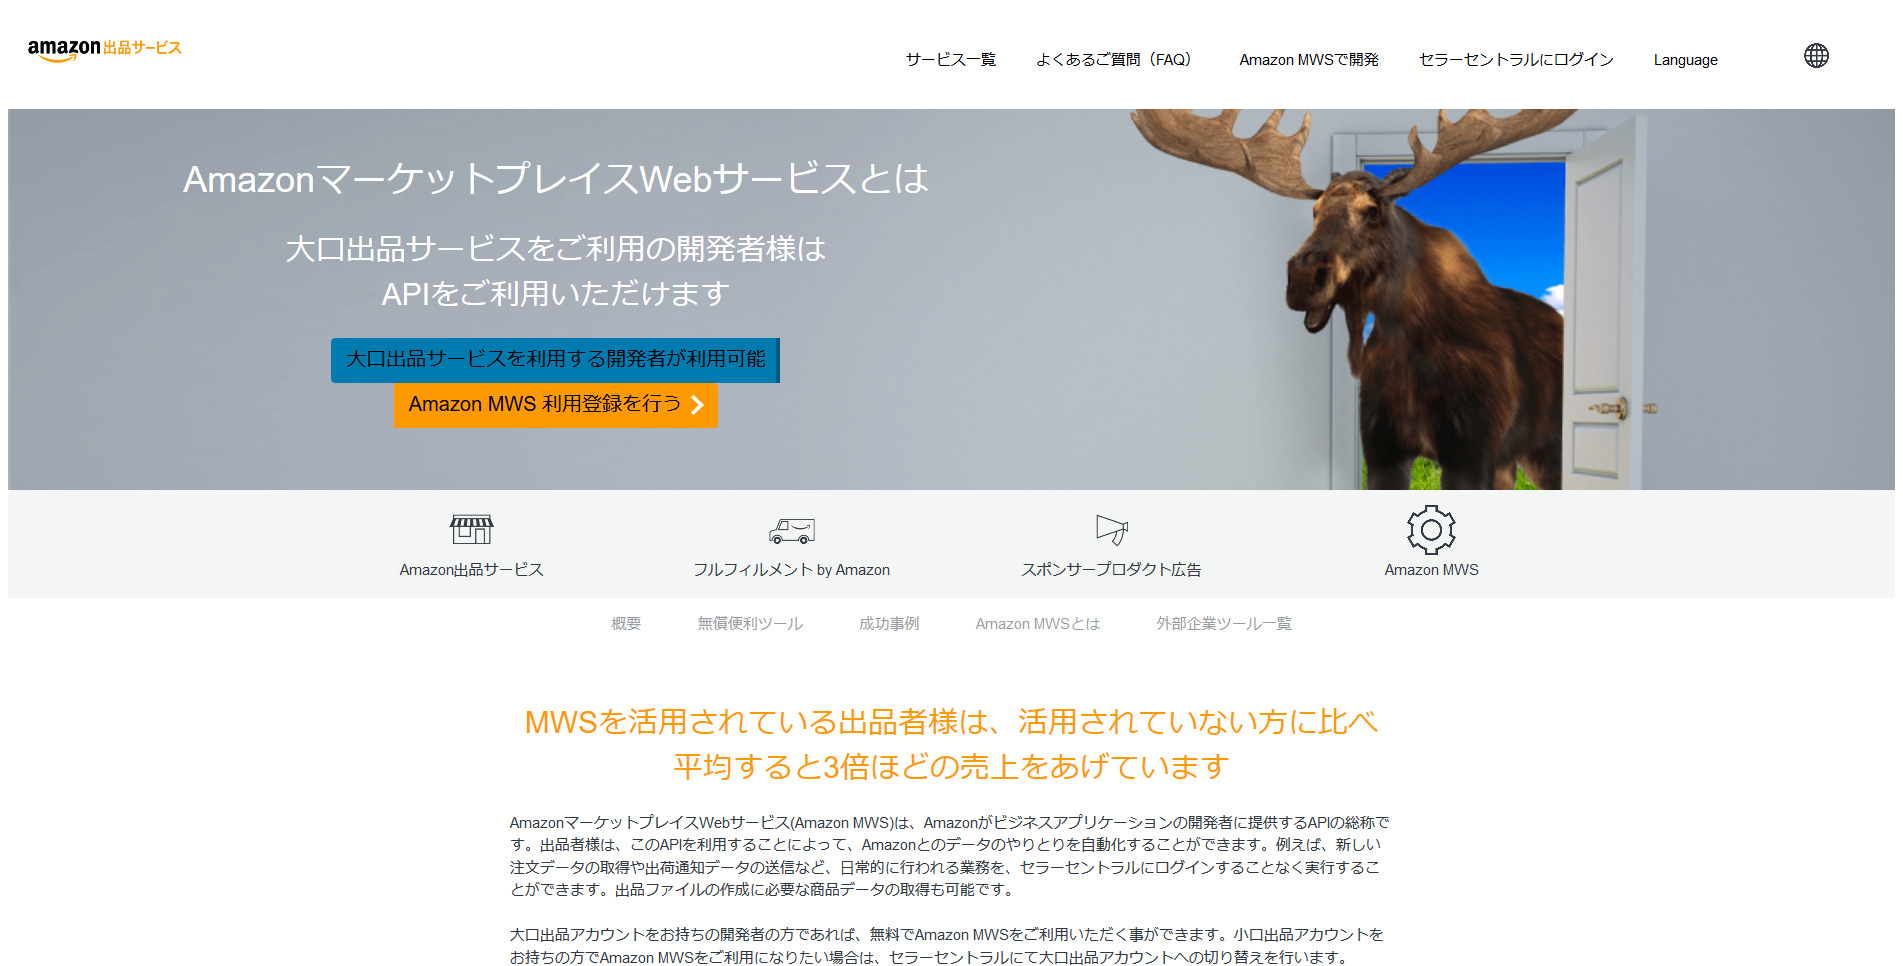 Amazon マーケットプレイス公式サイト